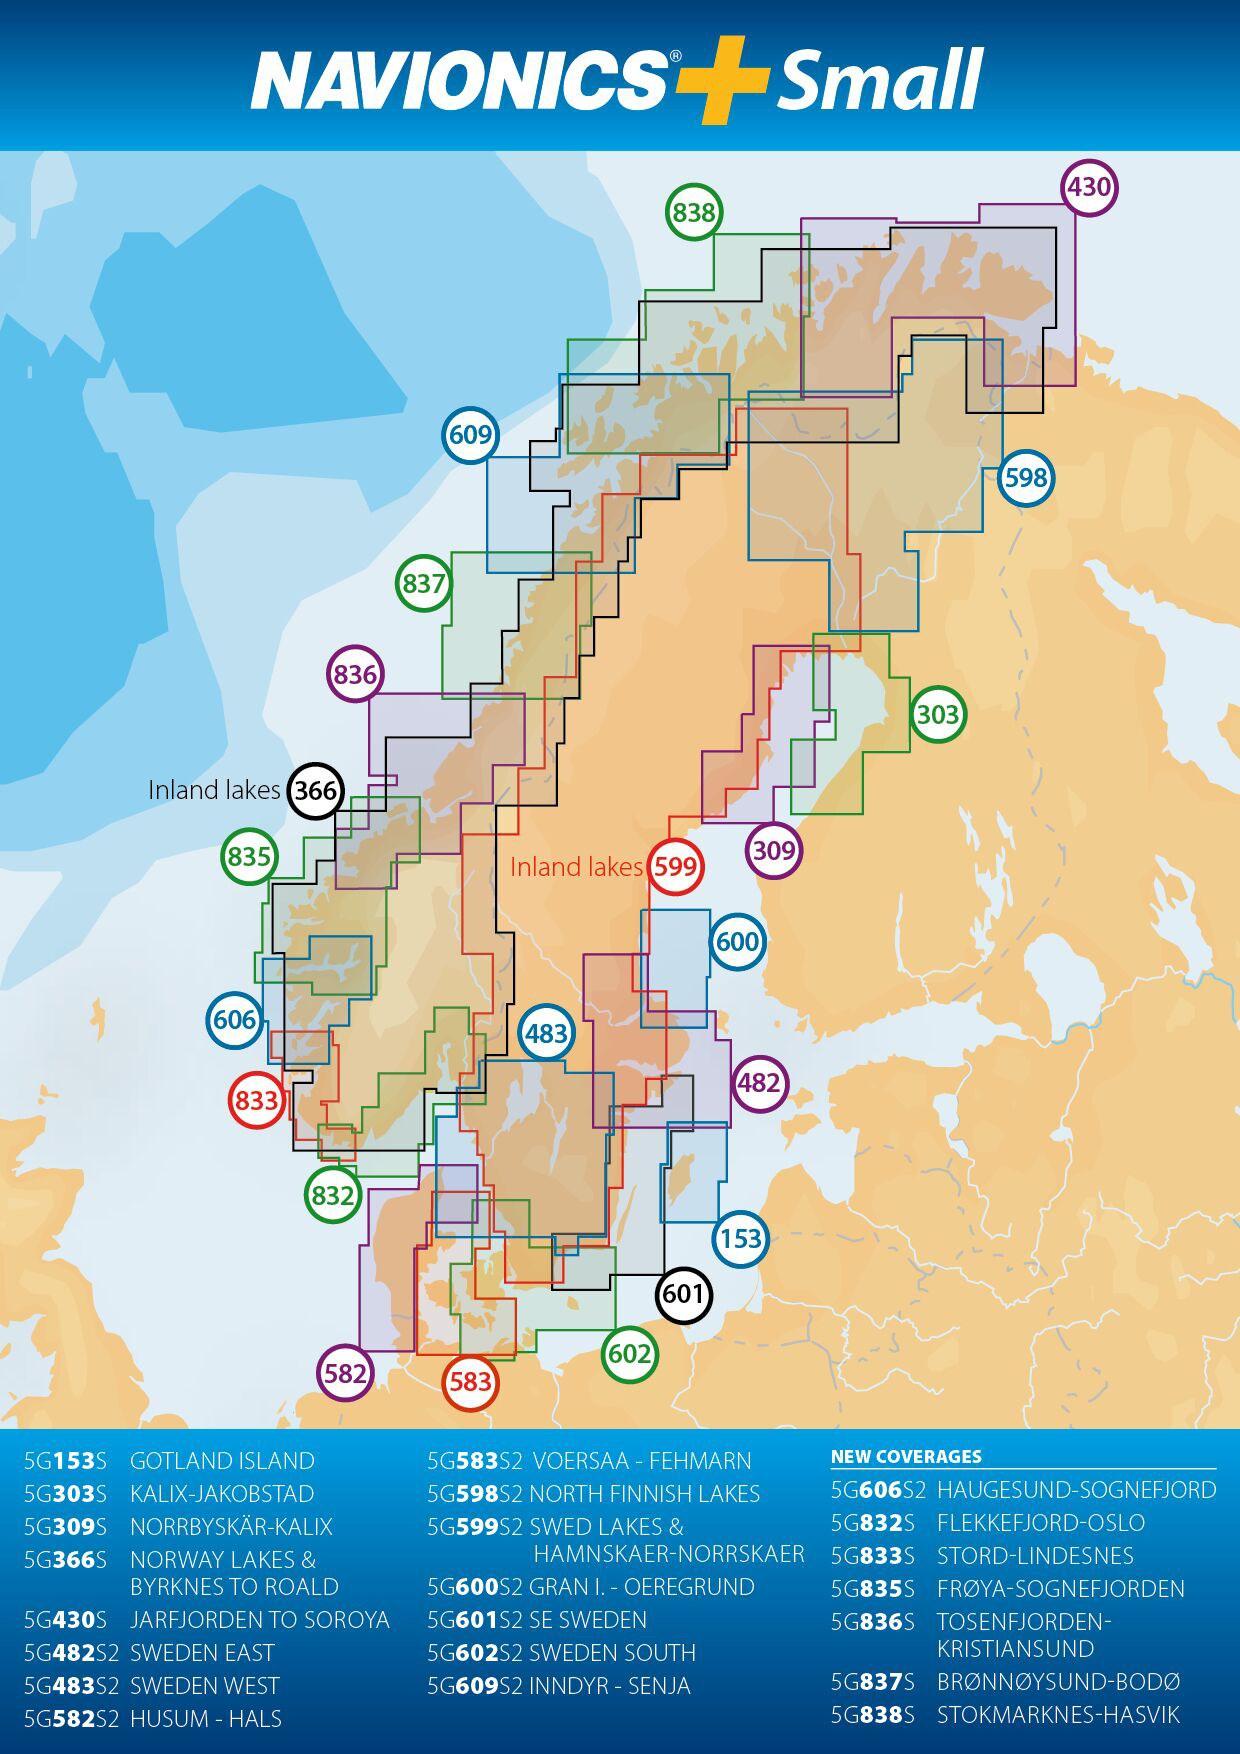 Navionics+ mSD/SD 602S Varberg-Karlskrona